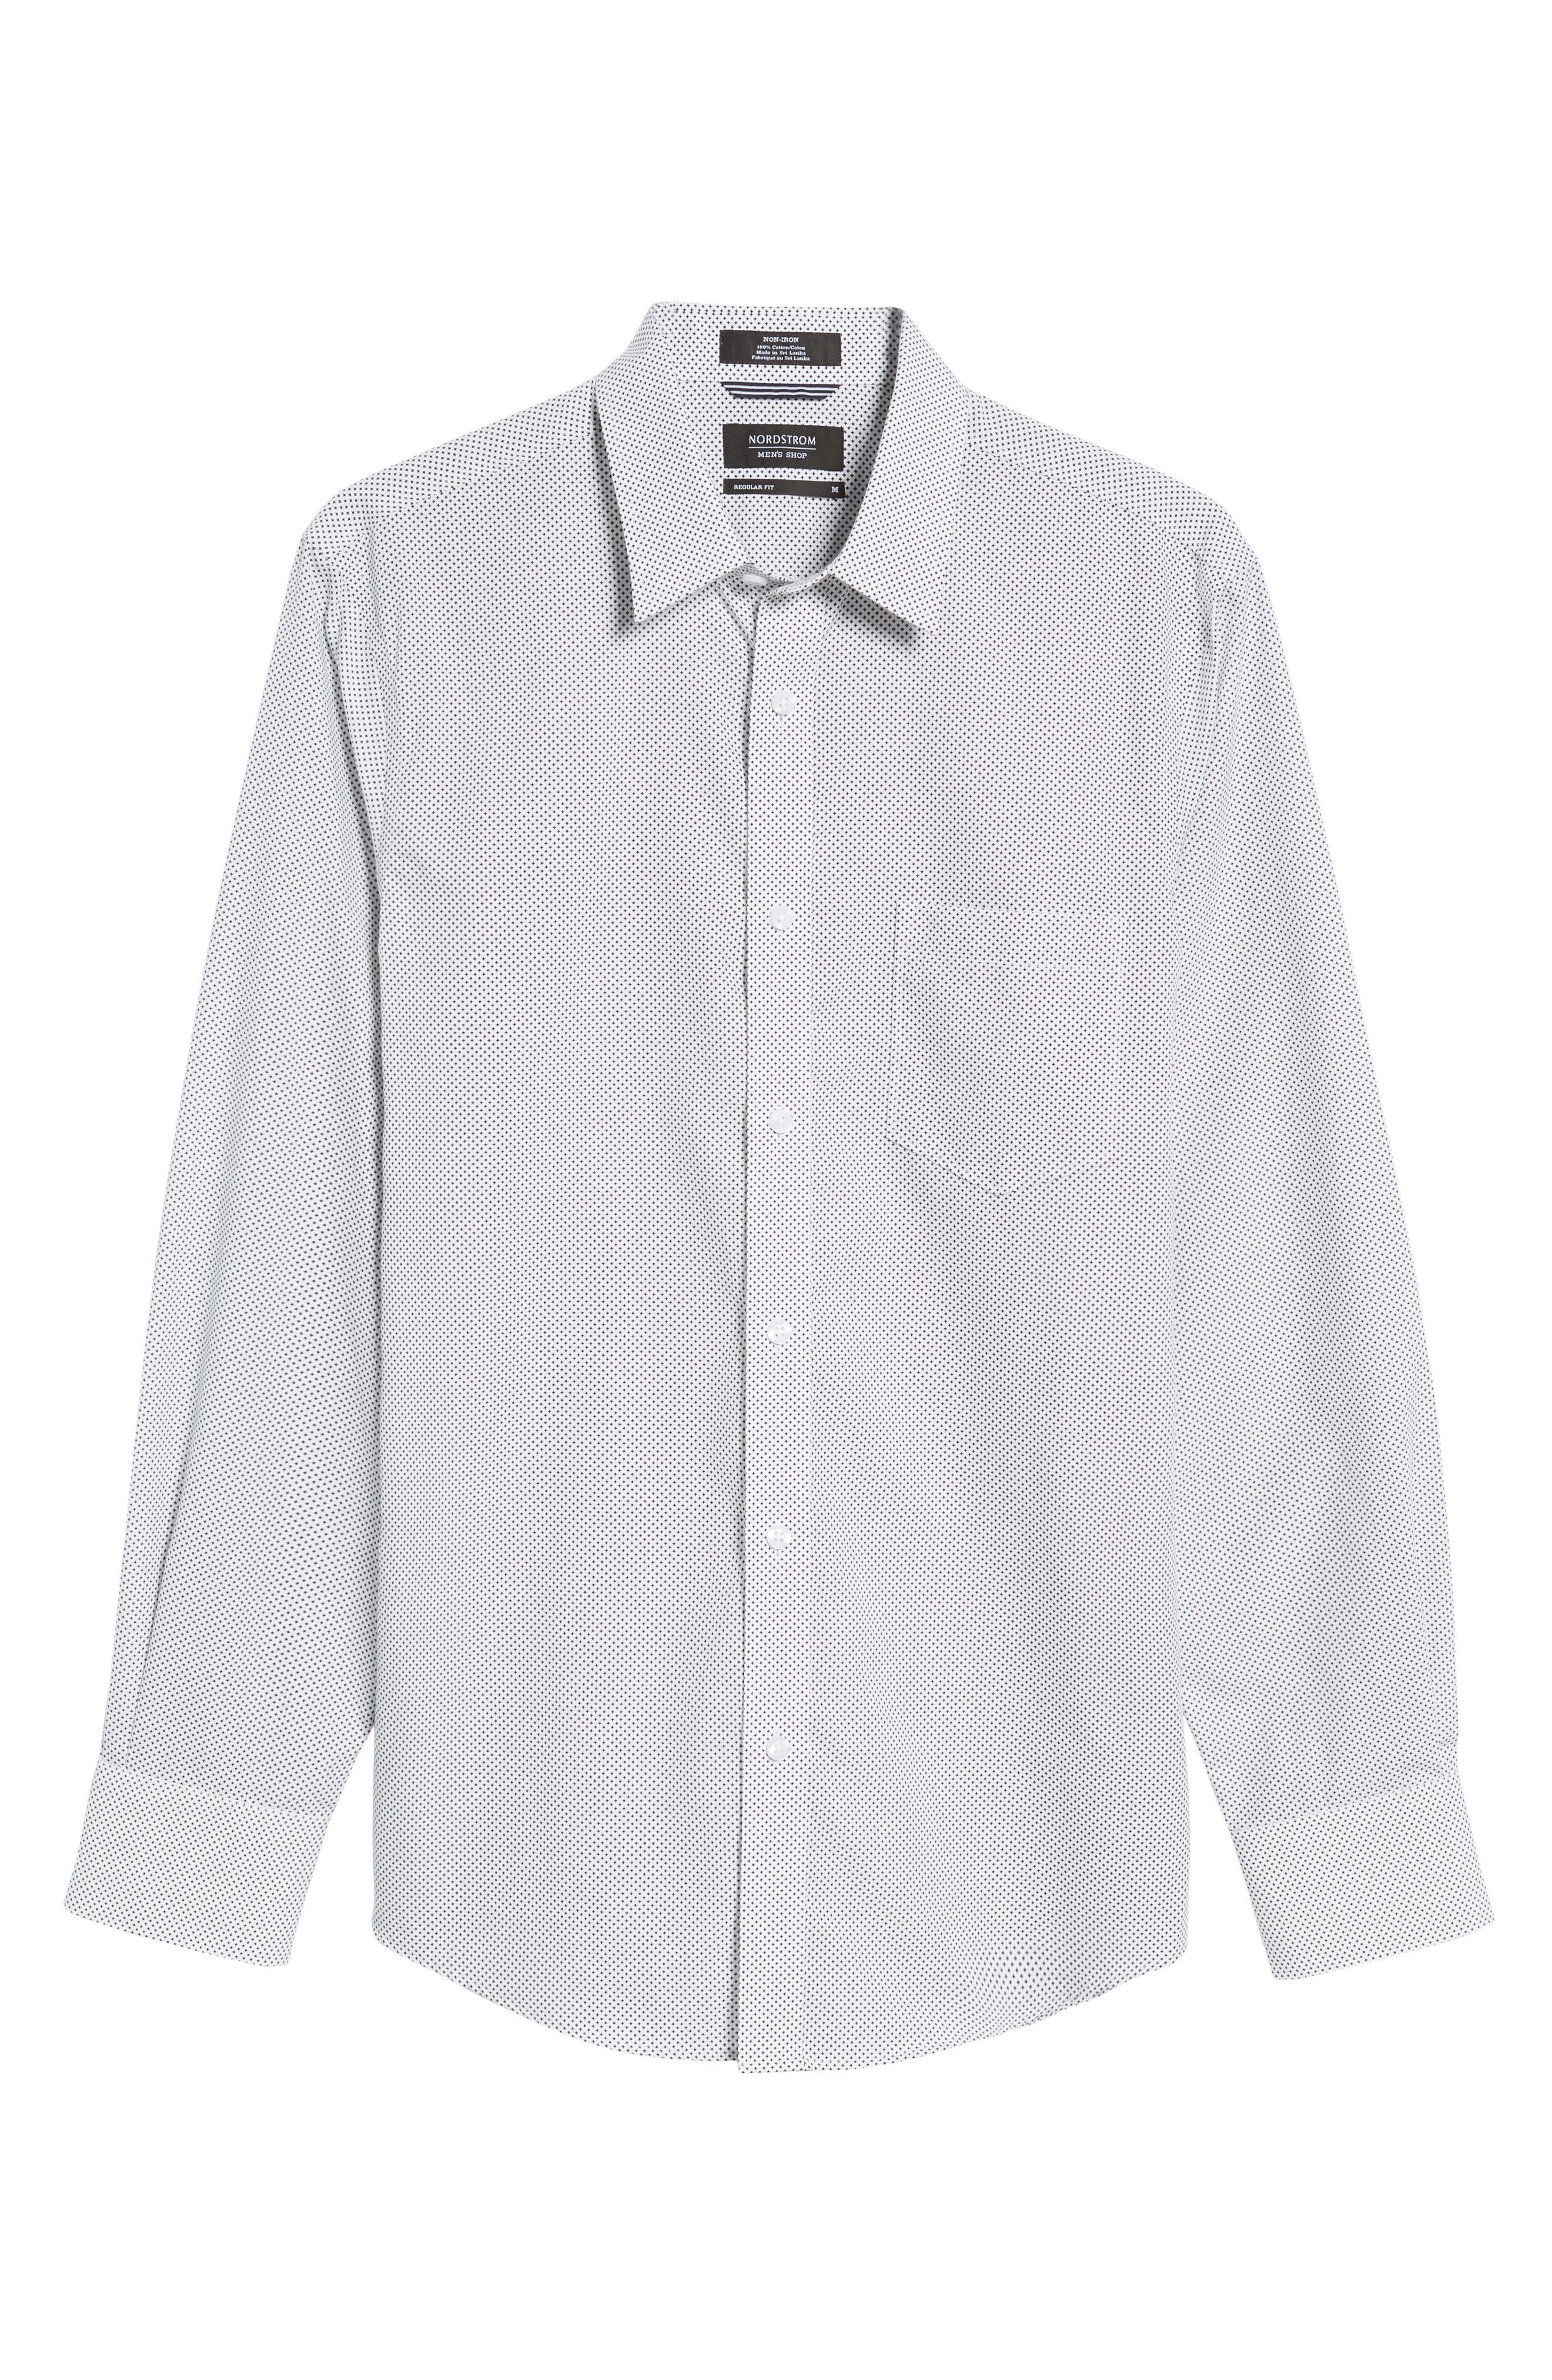 Regular Fit Non-Iron Print Sport Shirt,                             Alternate thumbnail 6, color,                             001